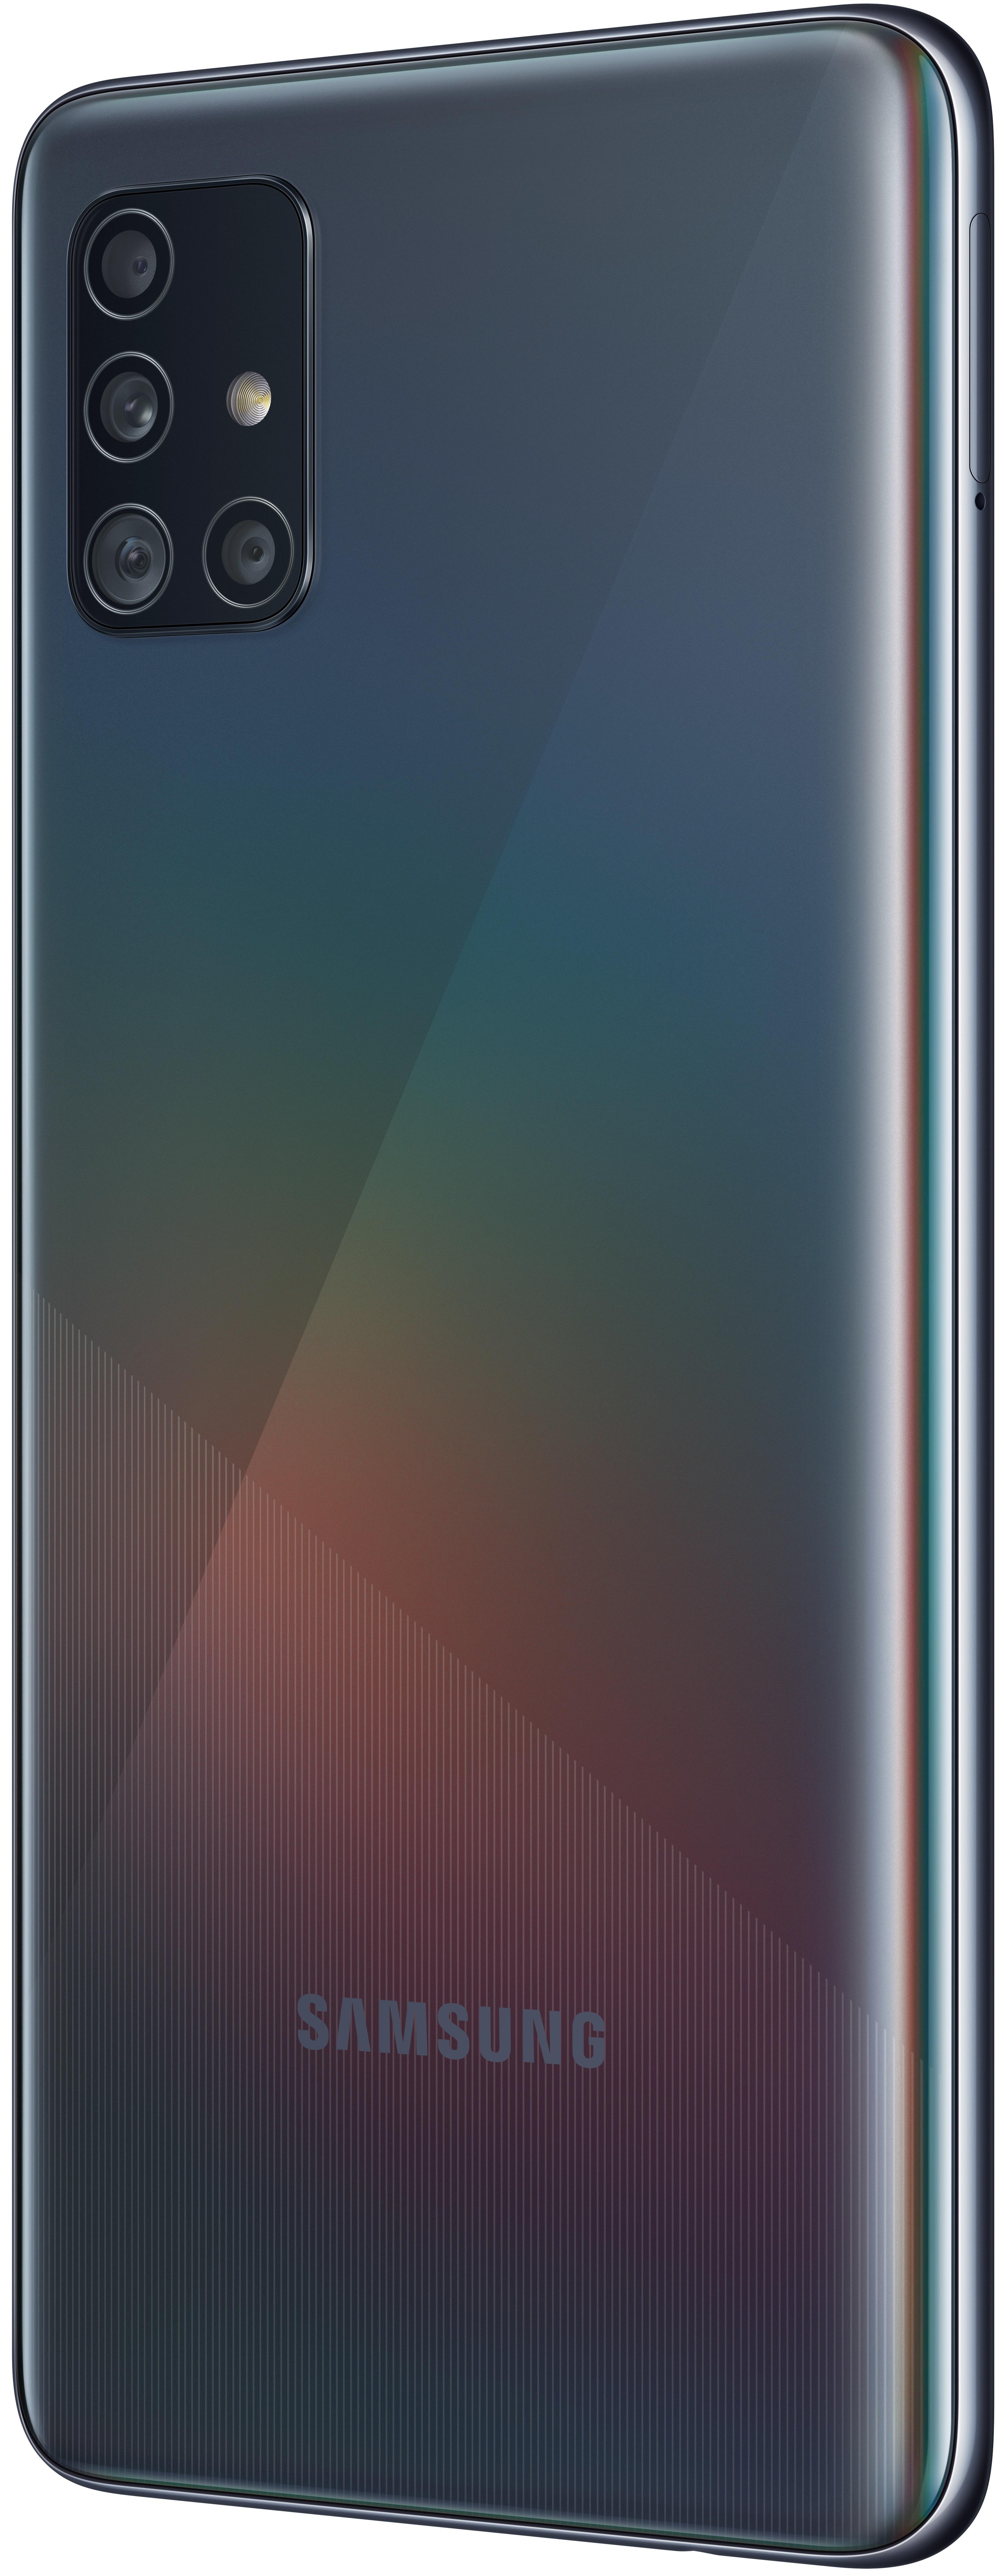 Smartphone Galaxy A51 Samsung Noir Prismatique